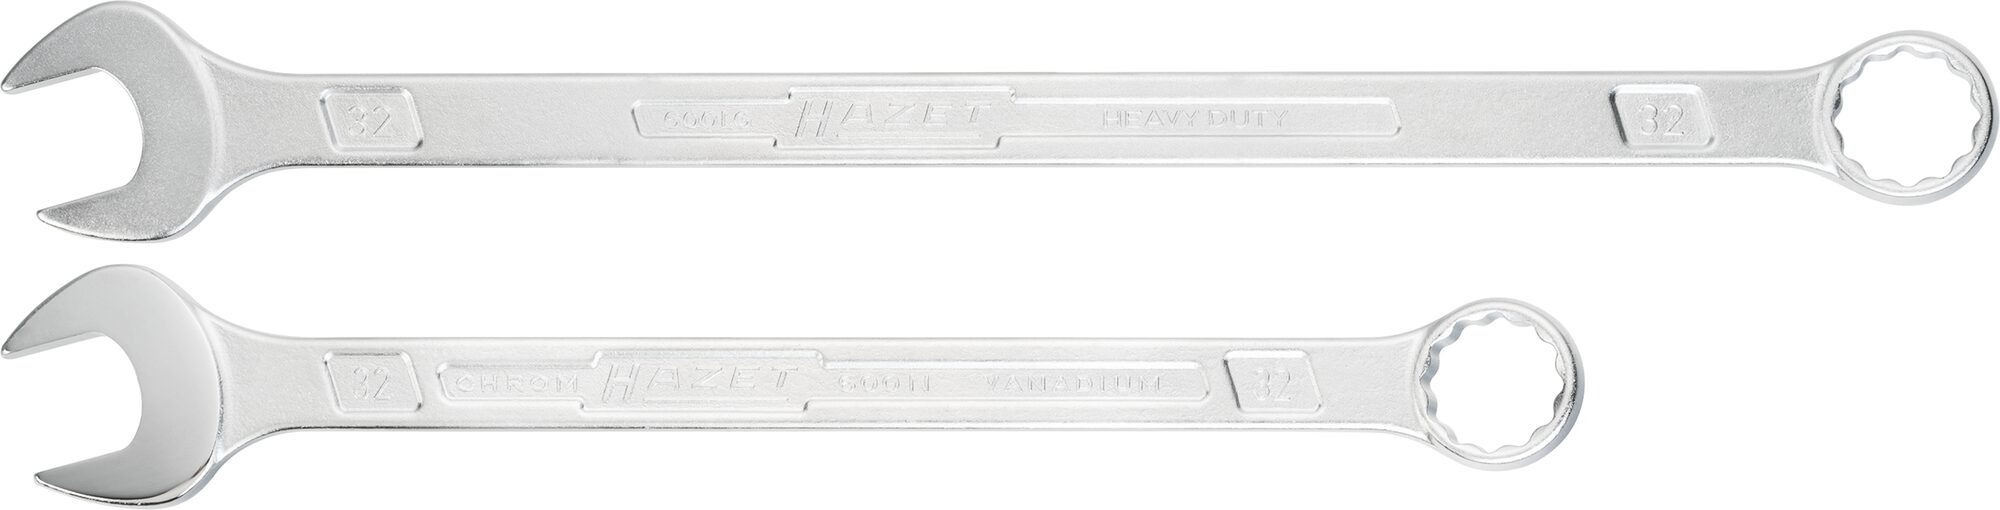 HAZET Ring-Maulschlüssel ∙ extra lang ∙ schlanke Bauform 600LG/13 ∙ Außen-Doppel-Sechskant-Tractionsprofil